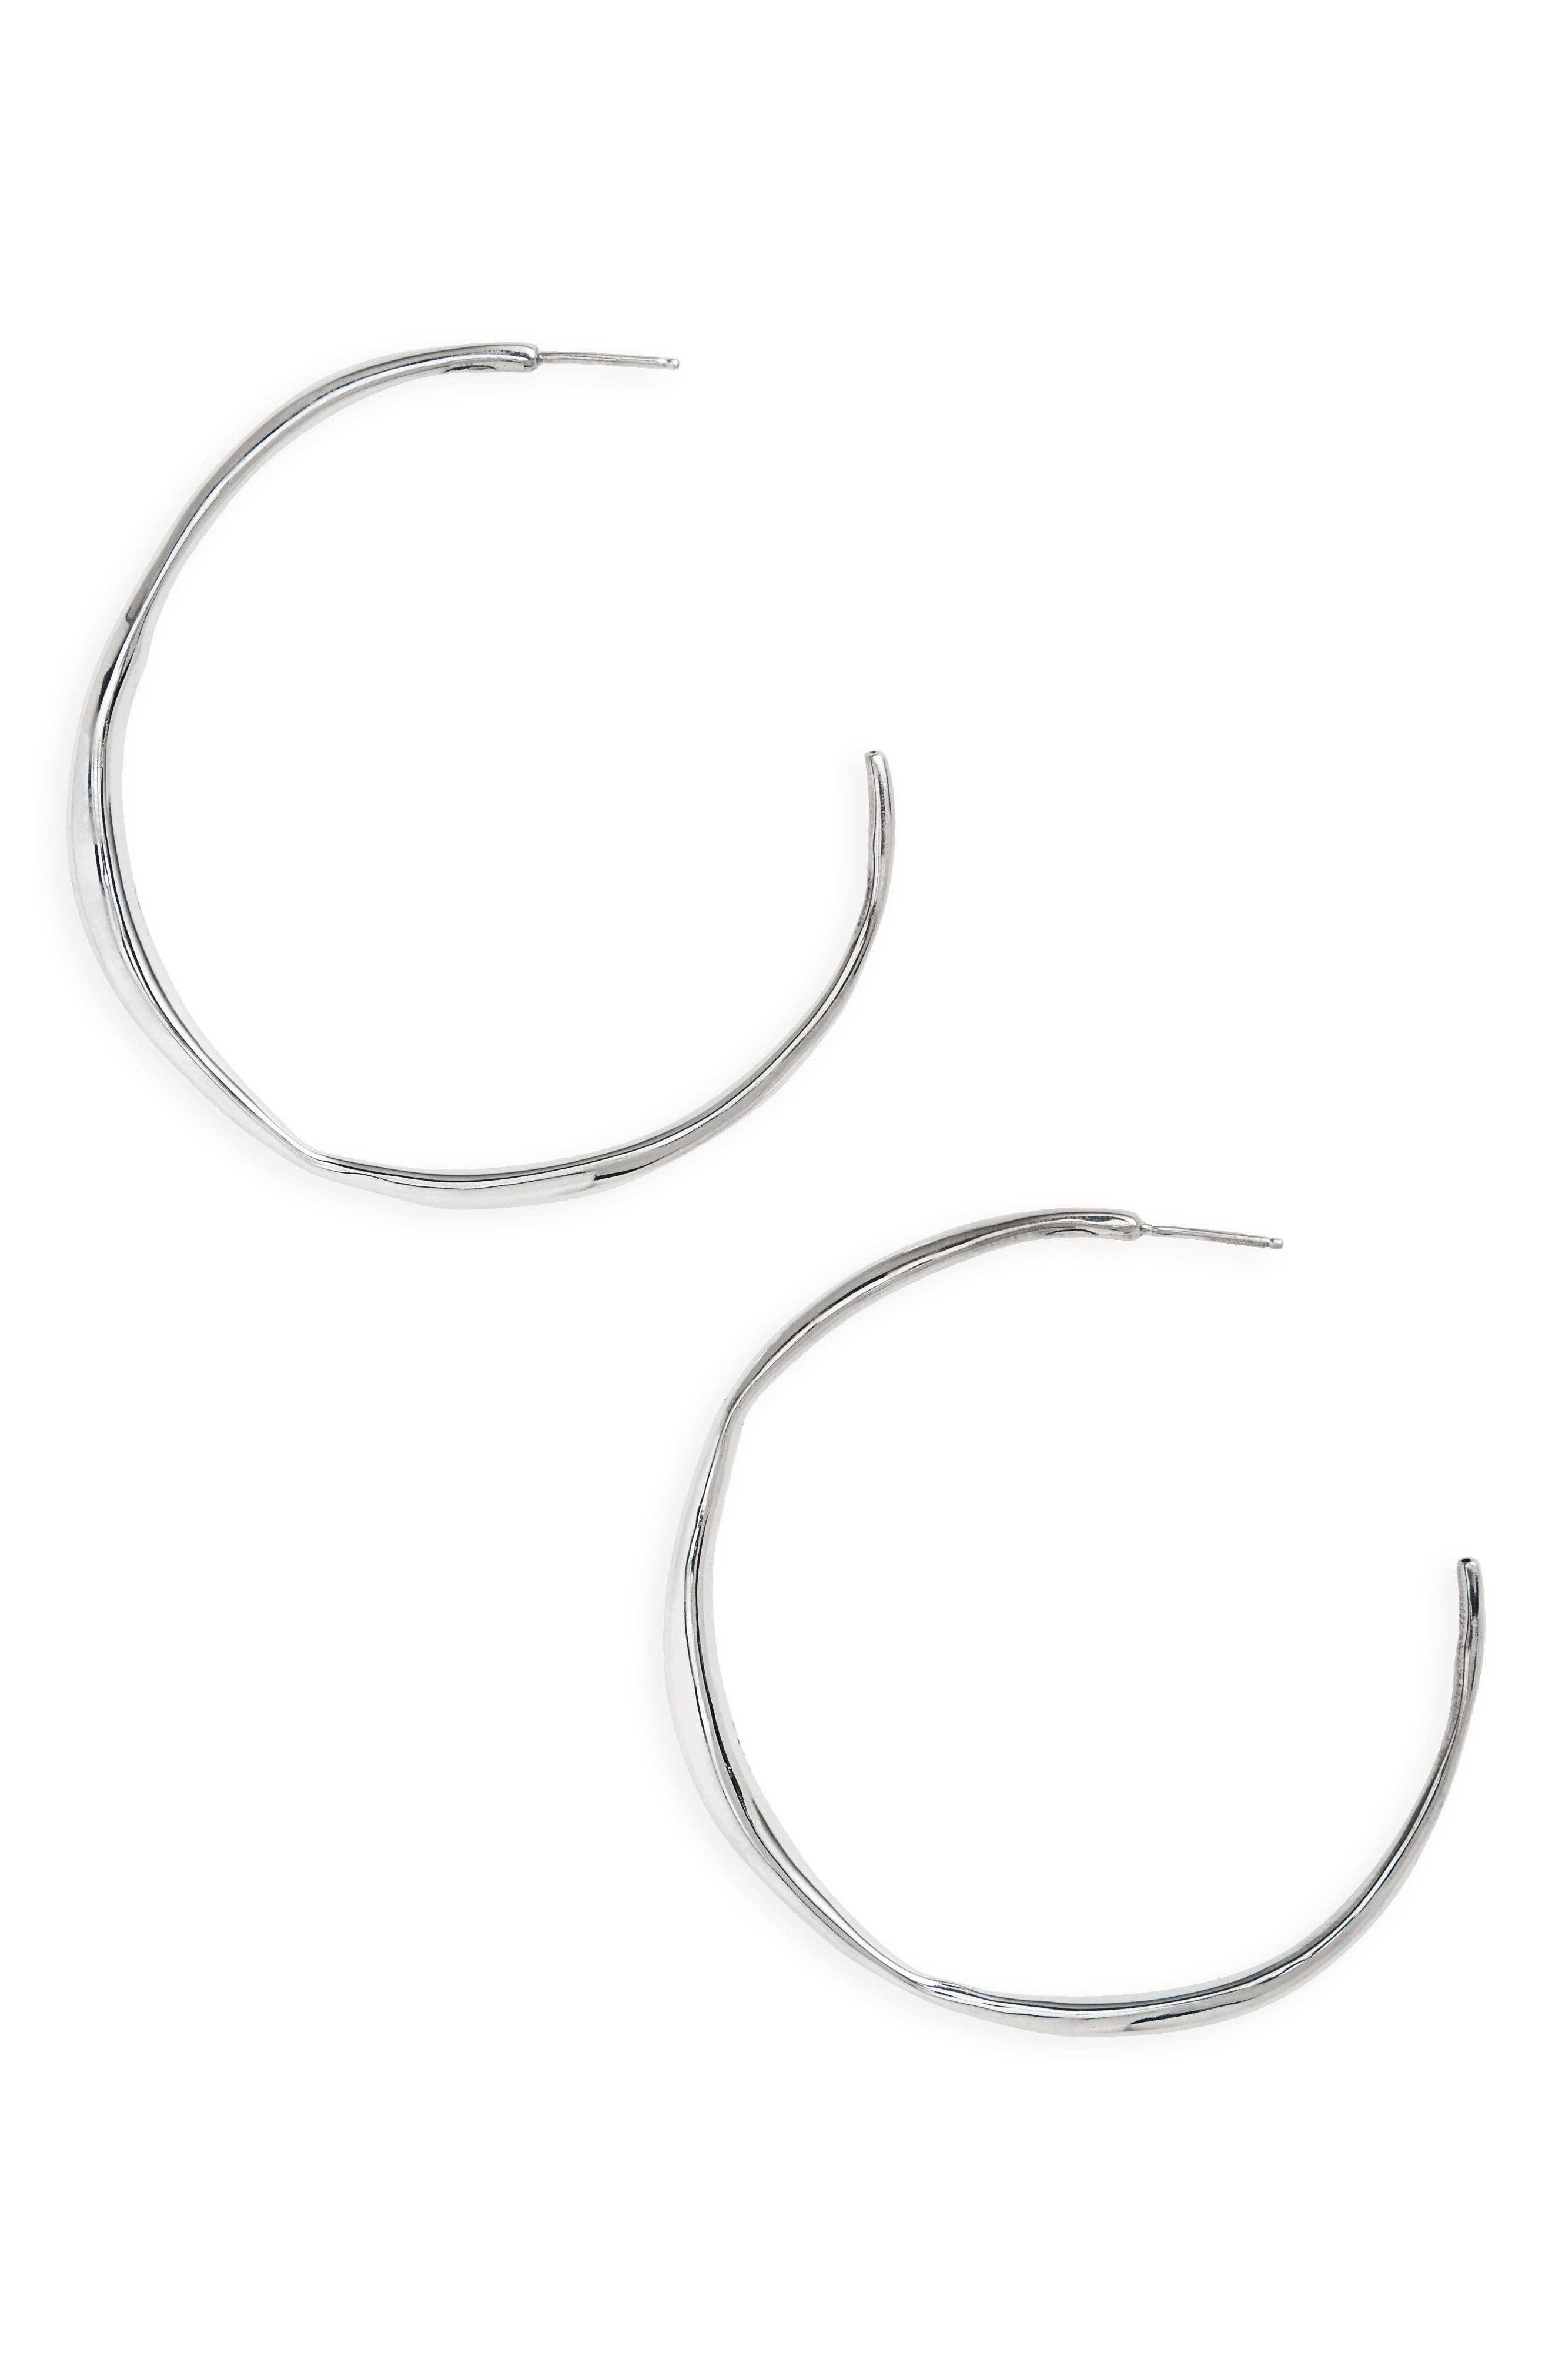 Medium Vero Hoops,                             Main thumbnail 1, color,                             Sterling Silver